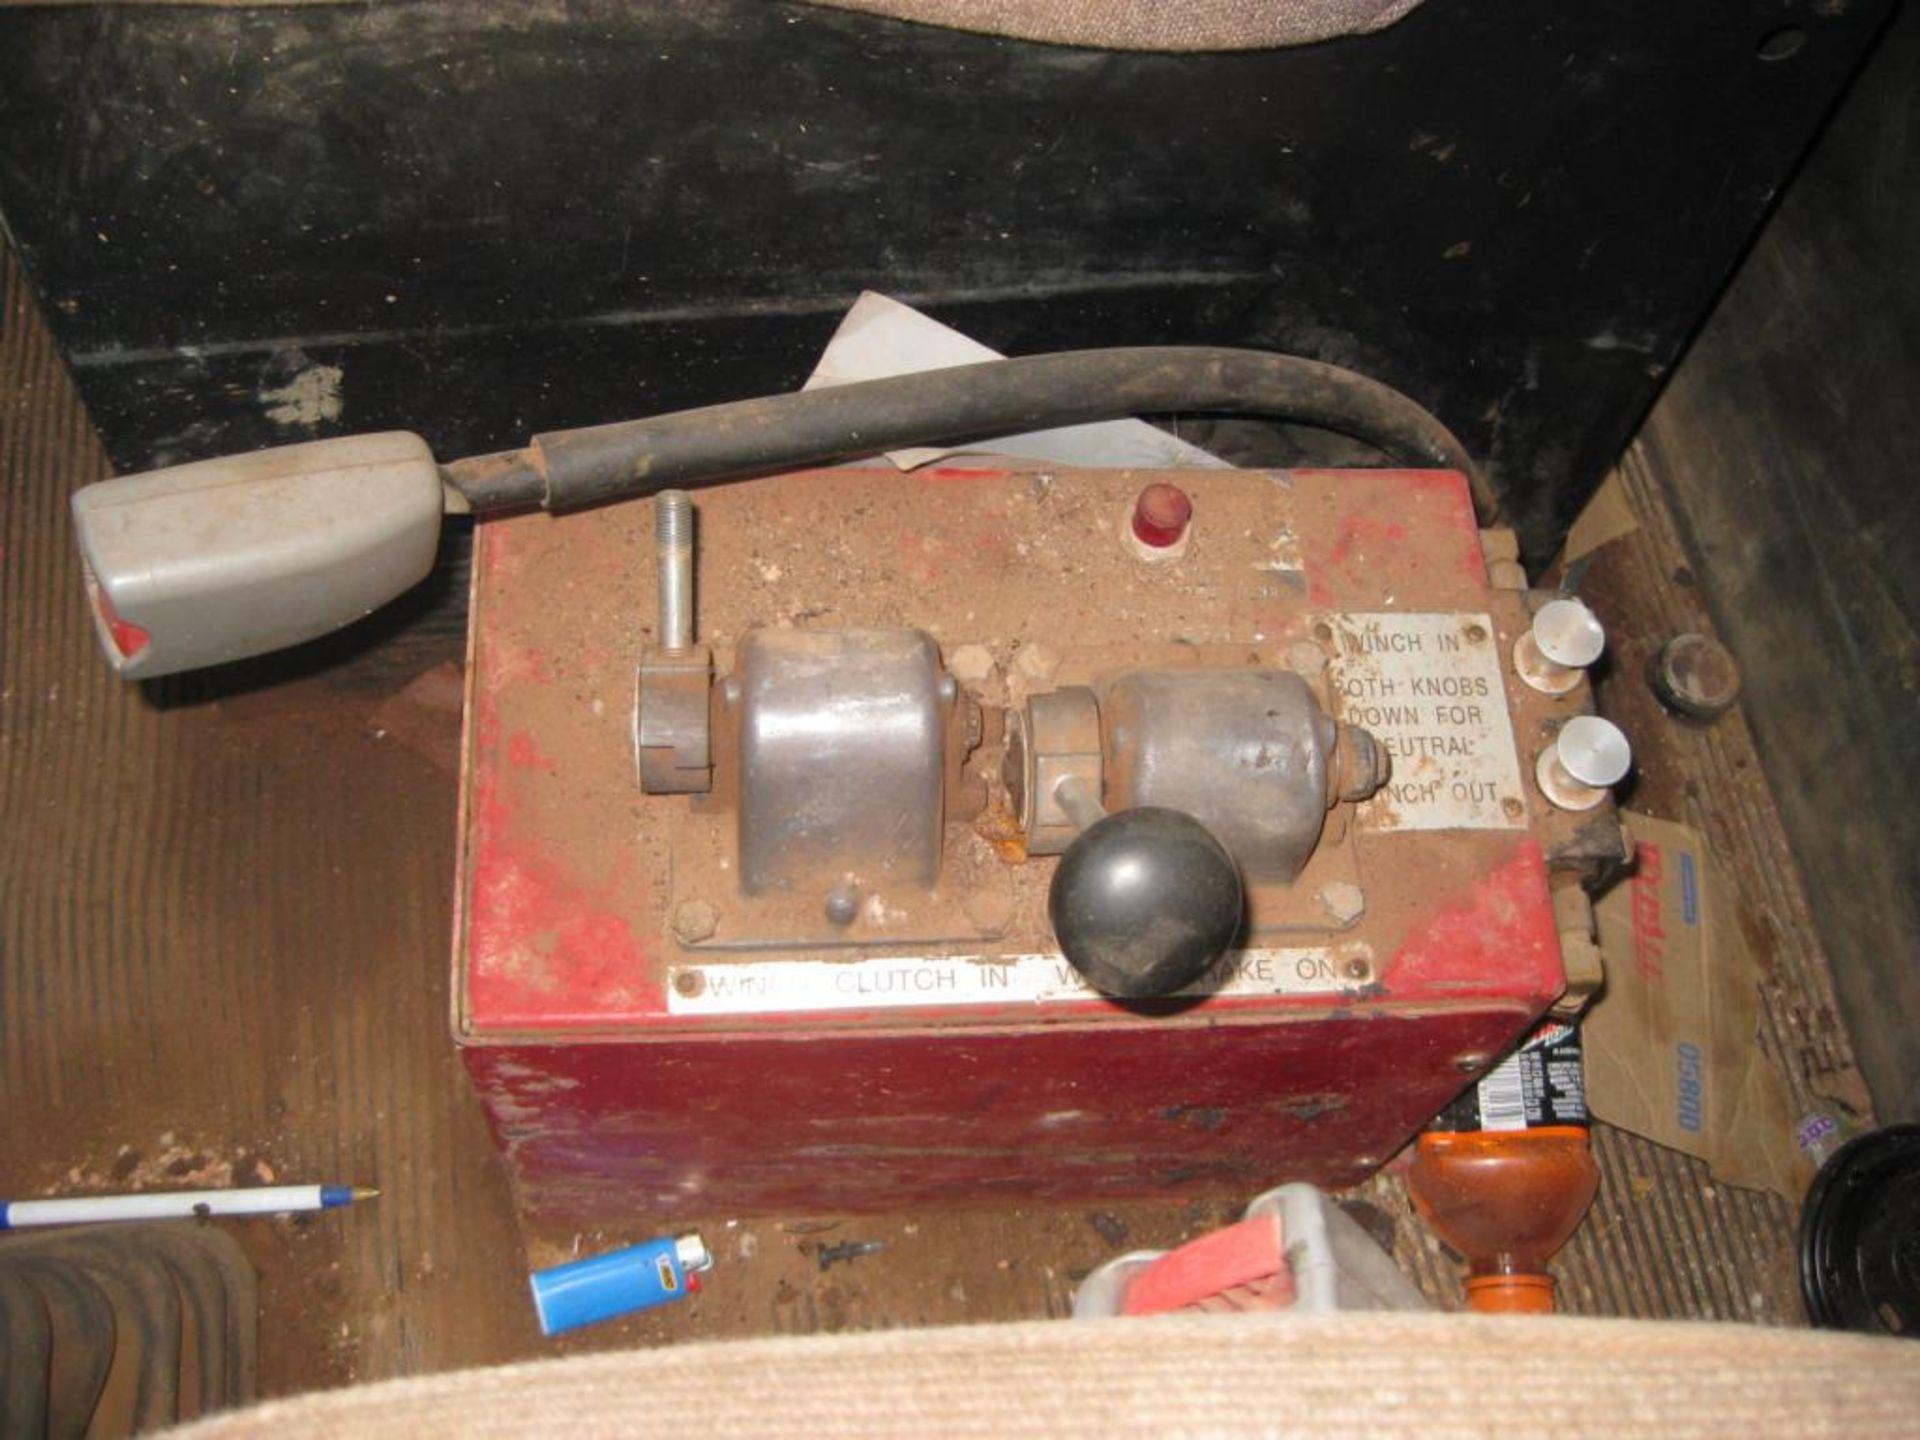 Kenworth Winch Truck - Image 15 of 22